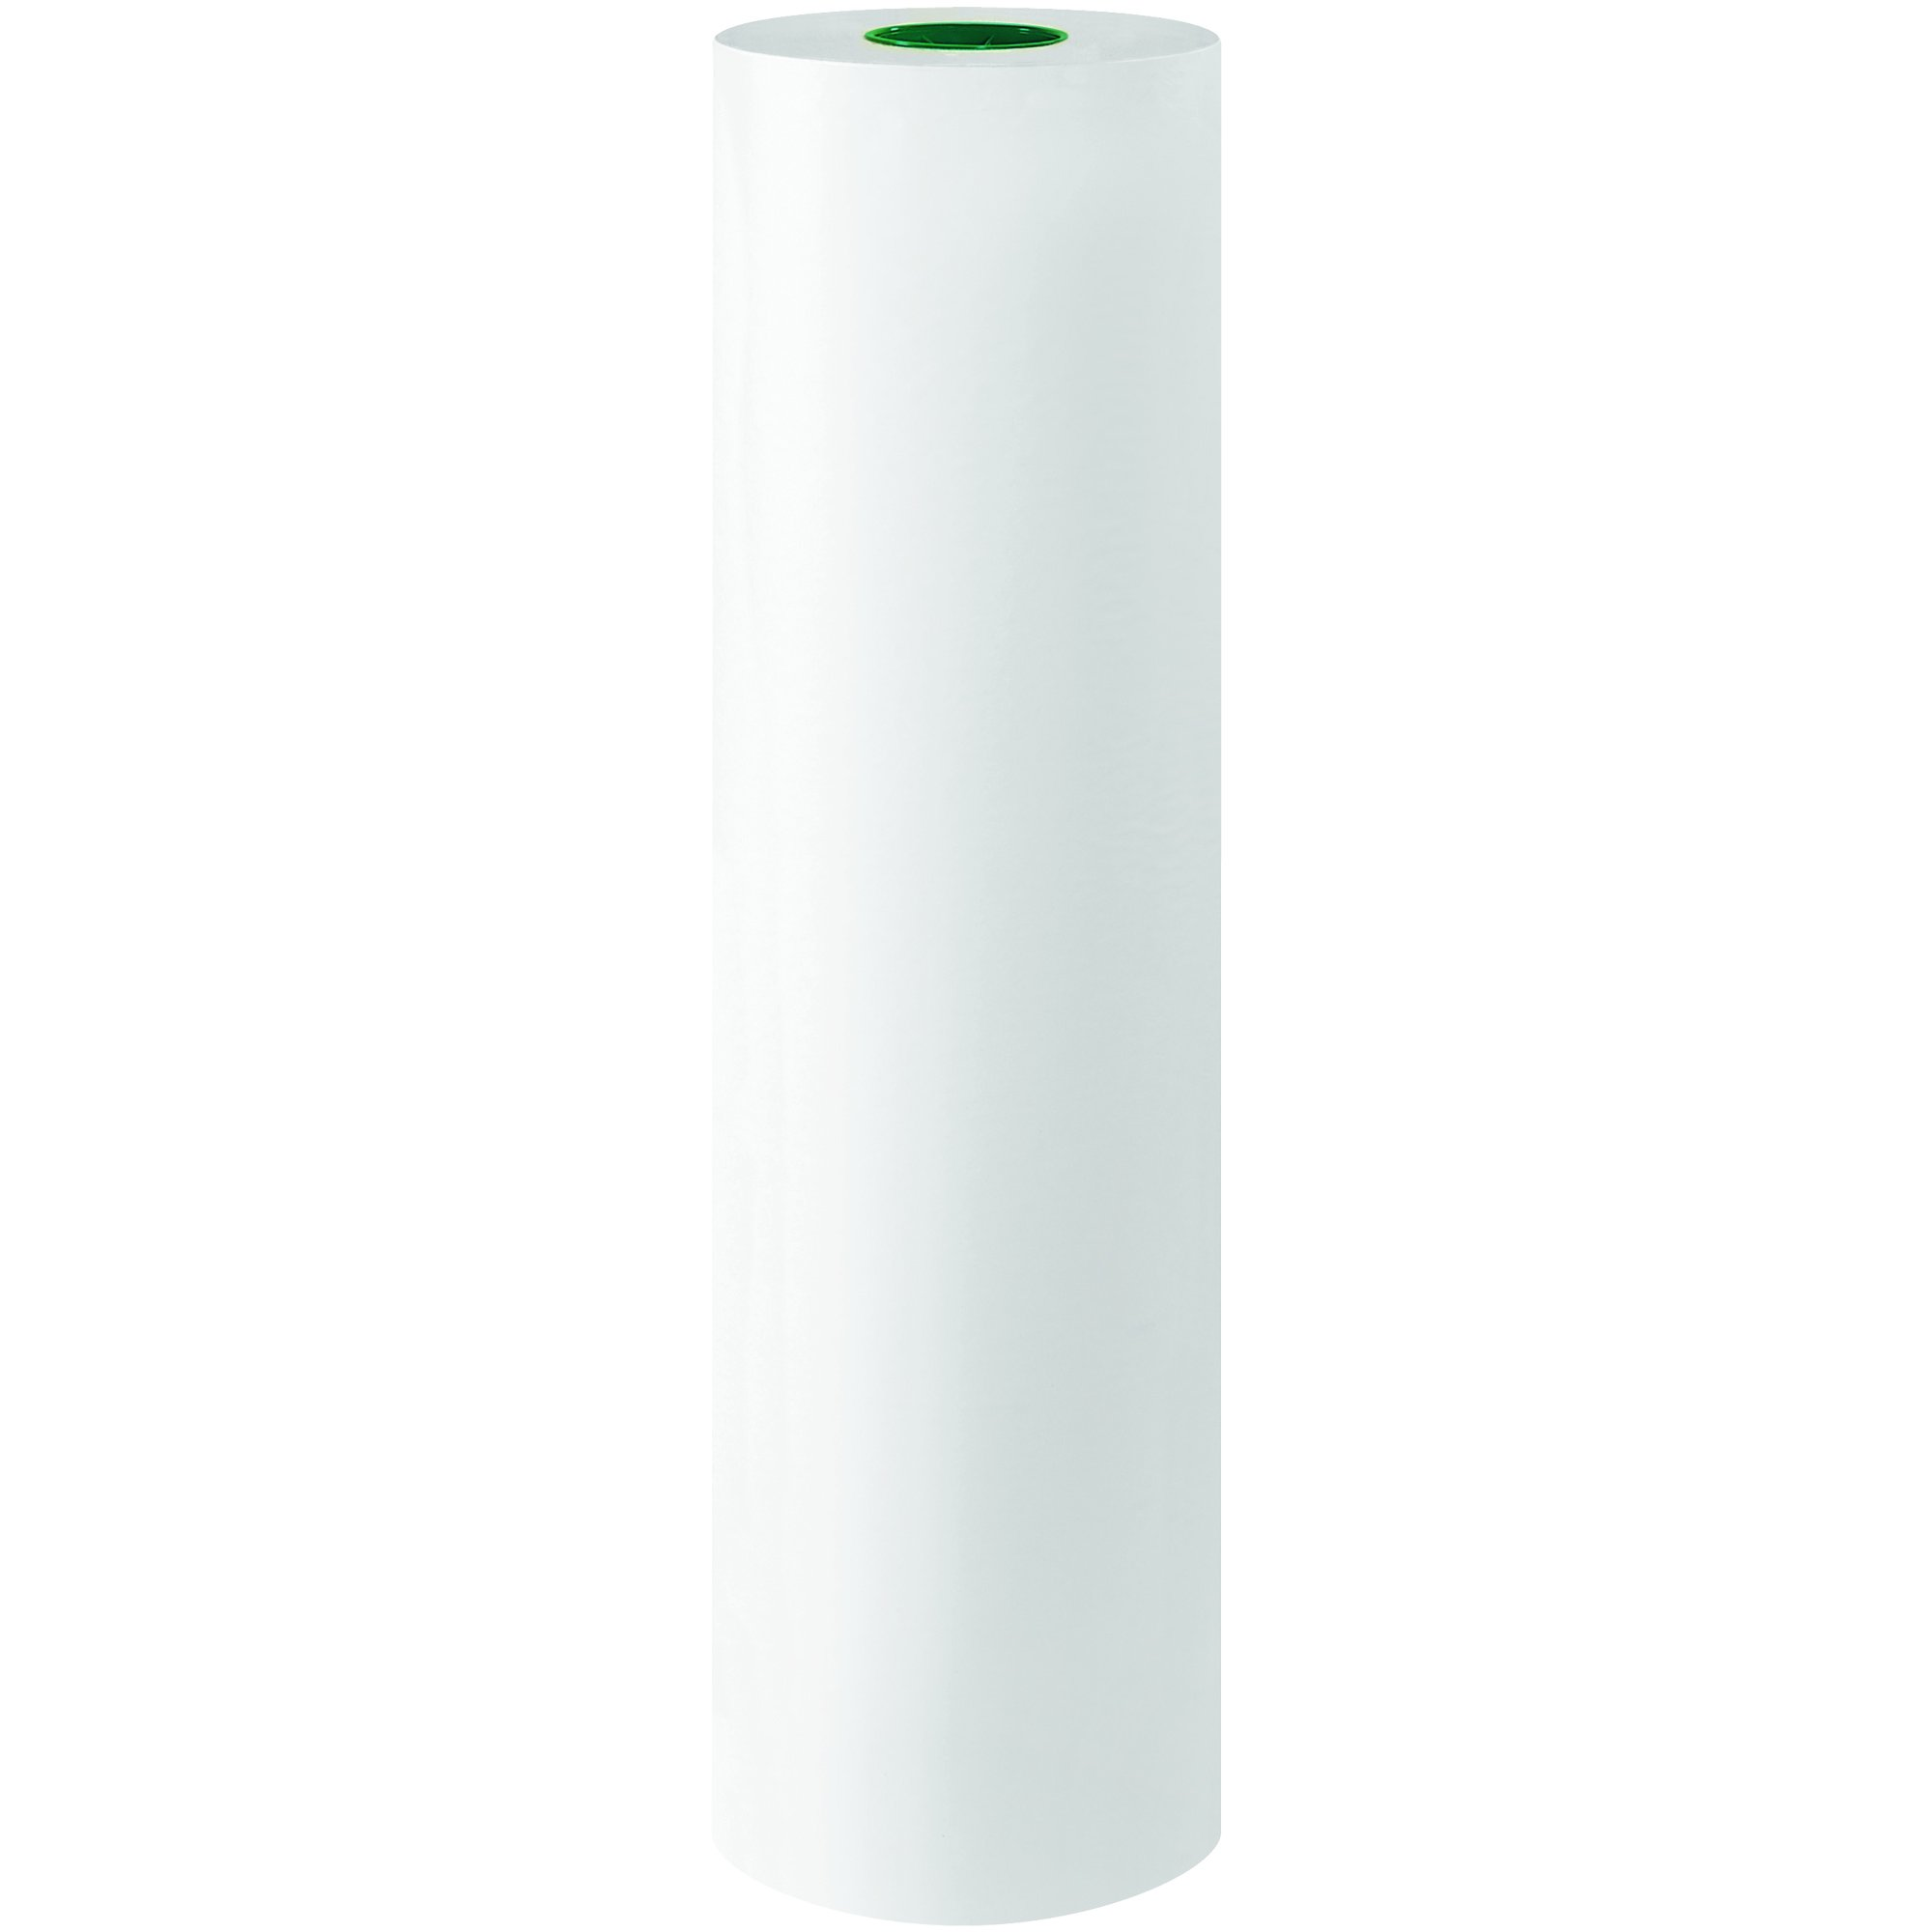 Aviditi FP3040 Freezer Paper Rolls, 30''